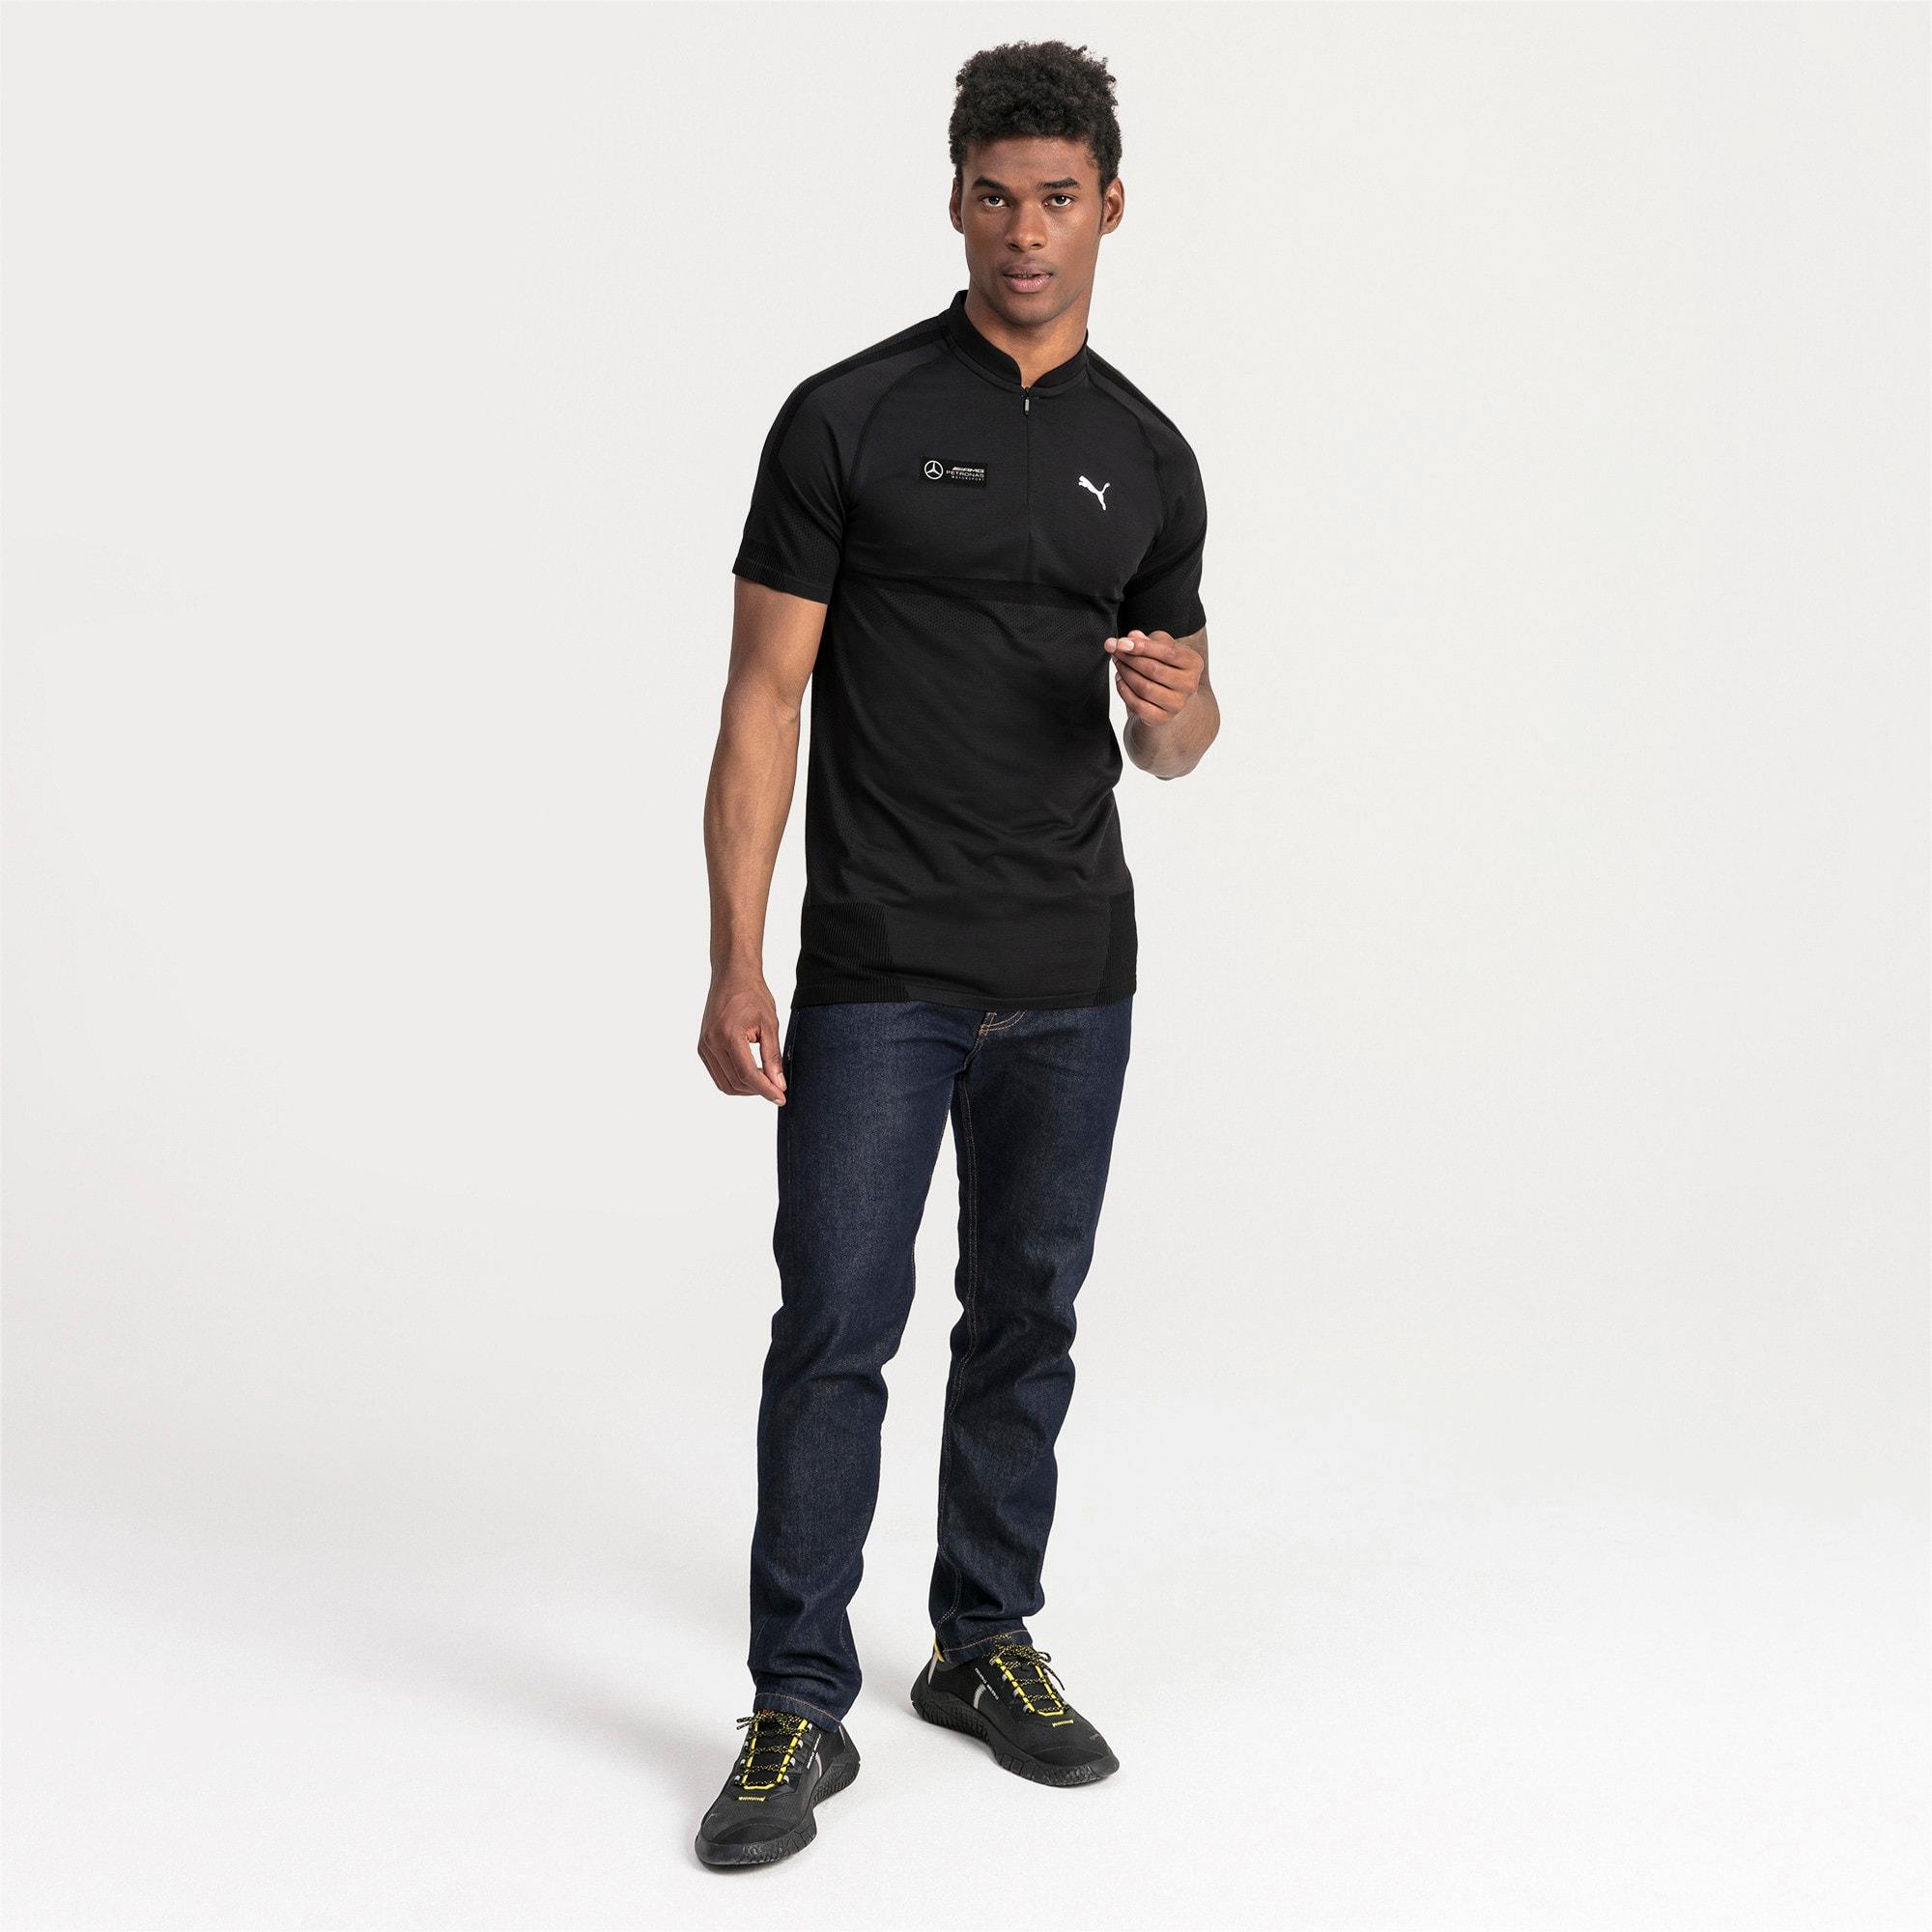 Thumbnail 3 of Mercedes AMG Petronas Men's Polo Shirt, Puma Black, medium